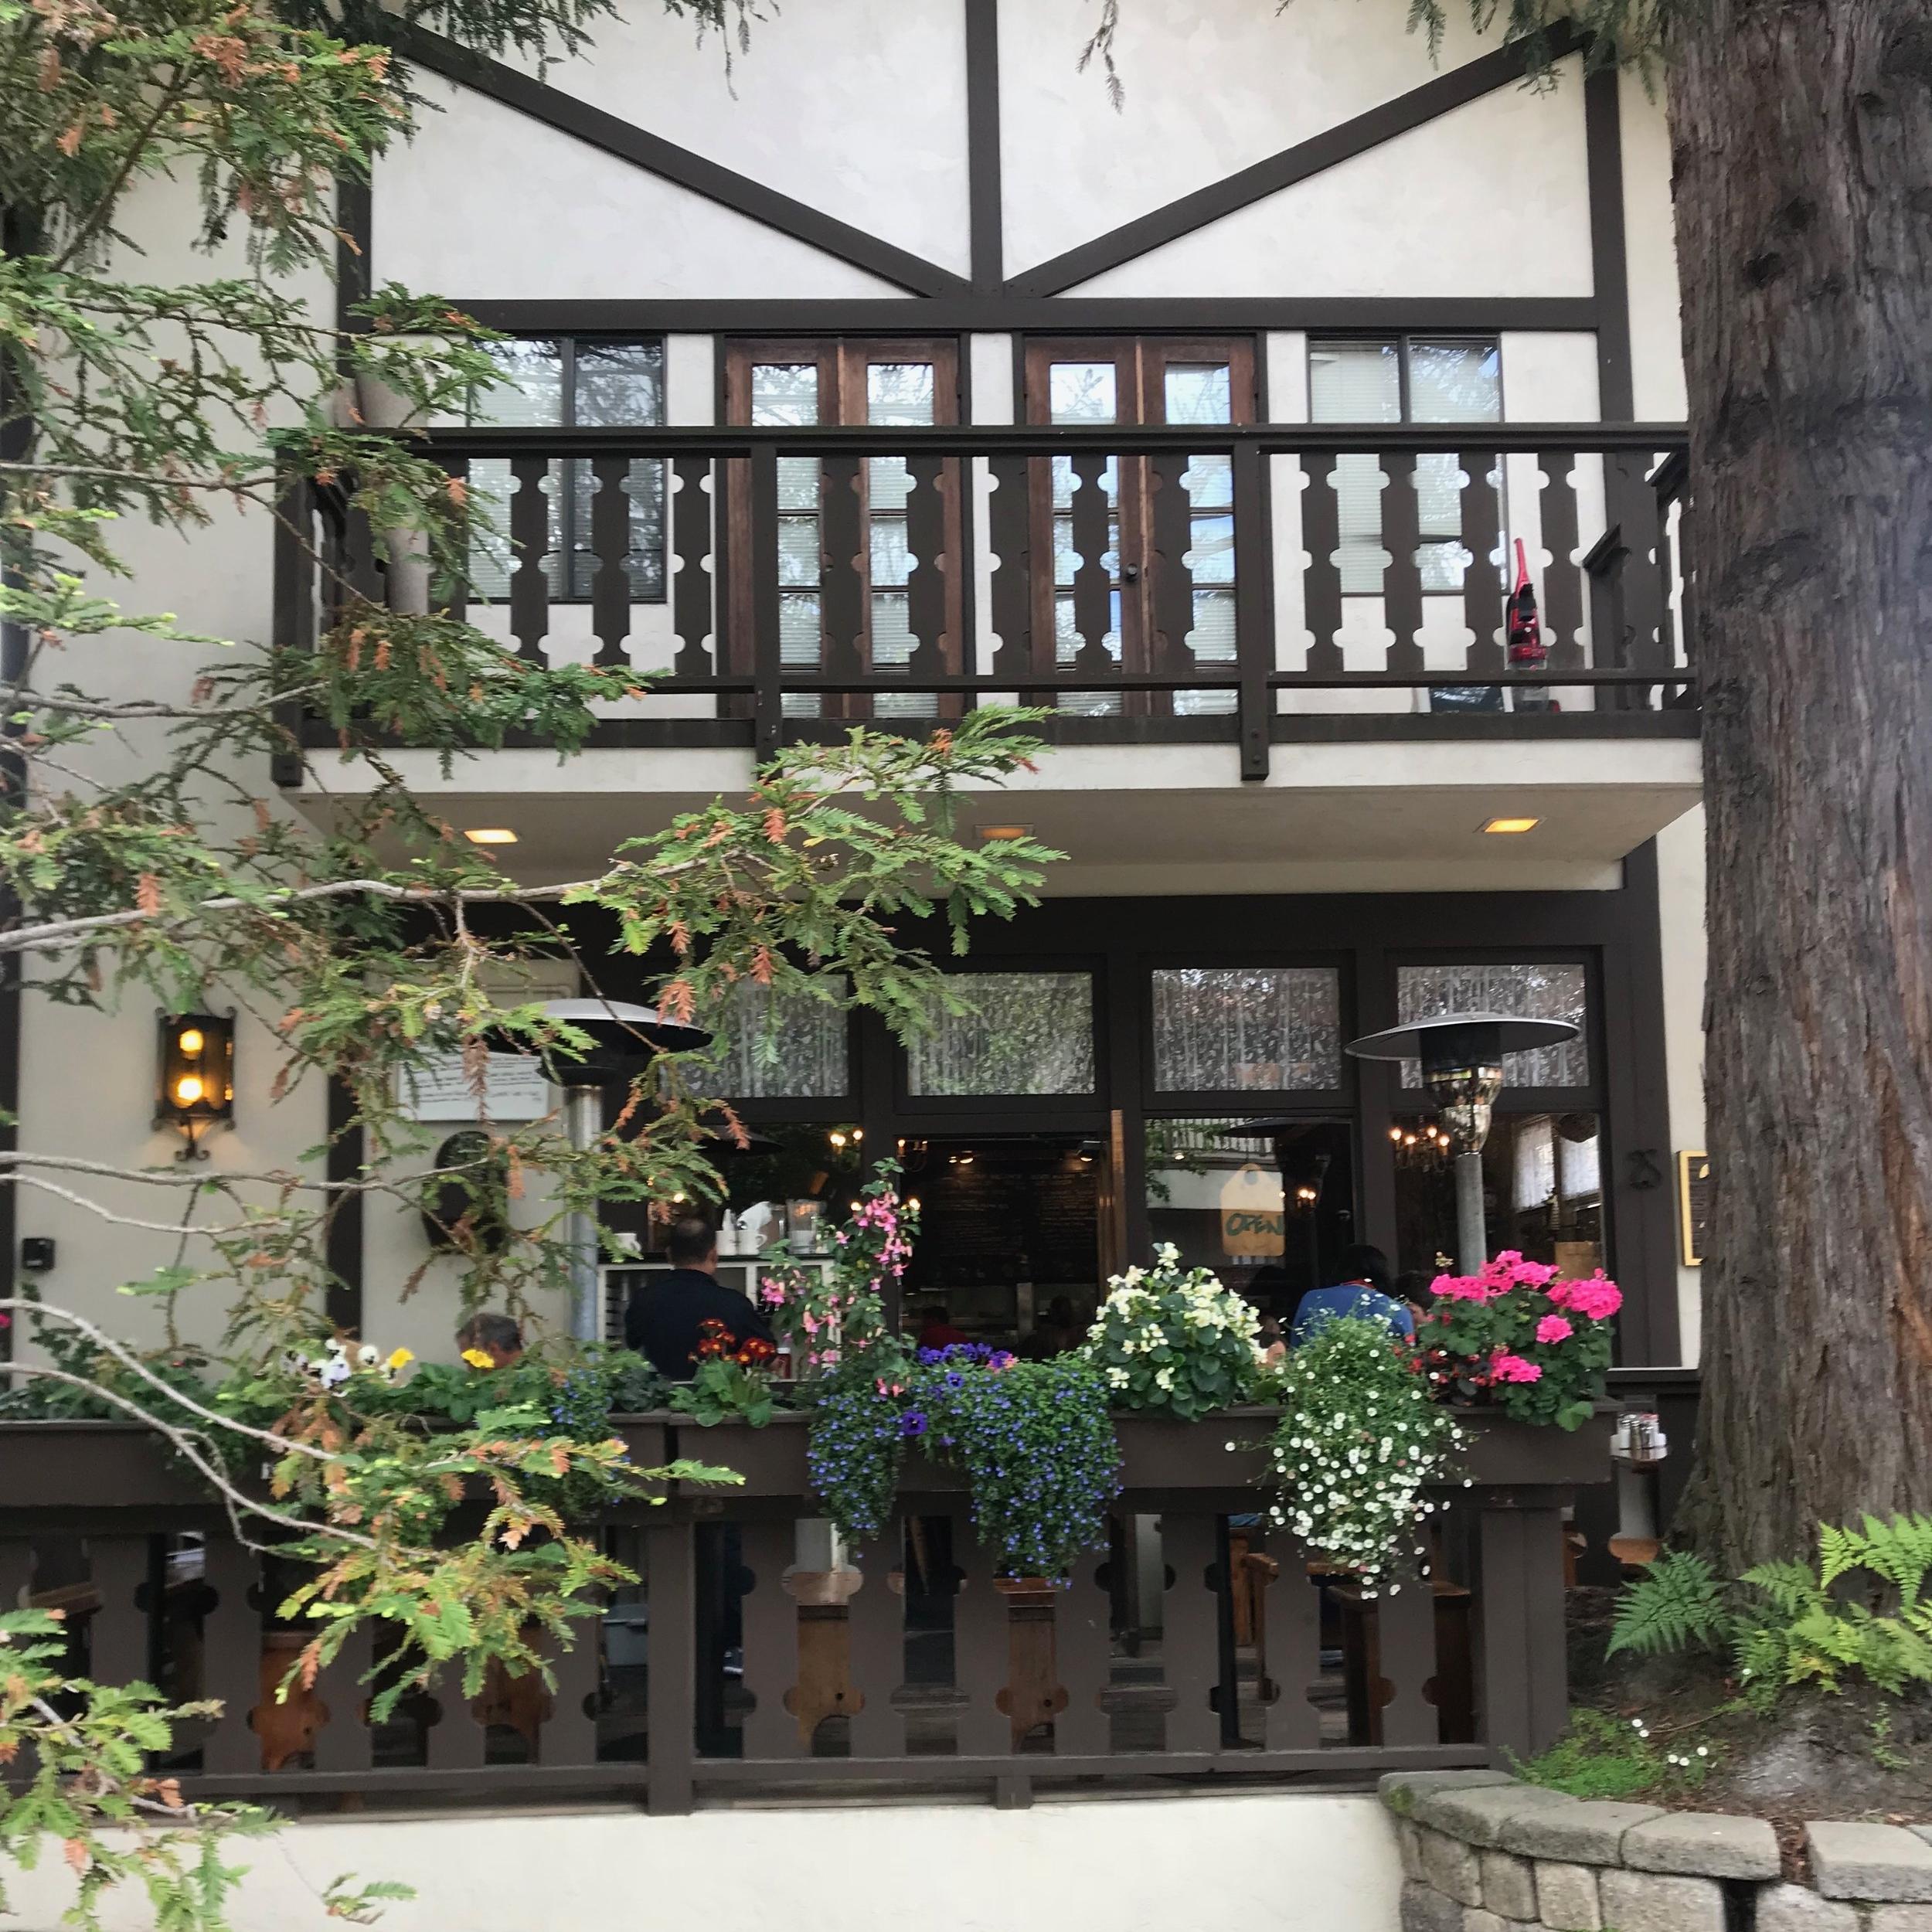 Katy's Place, Carmel